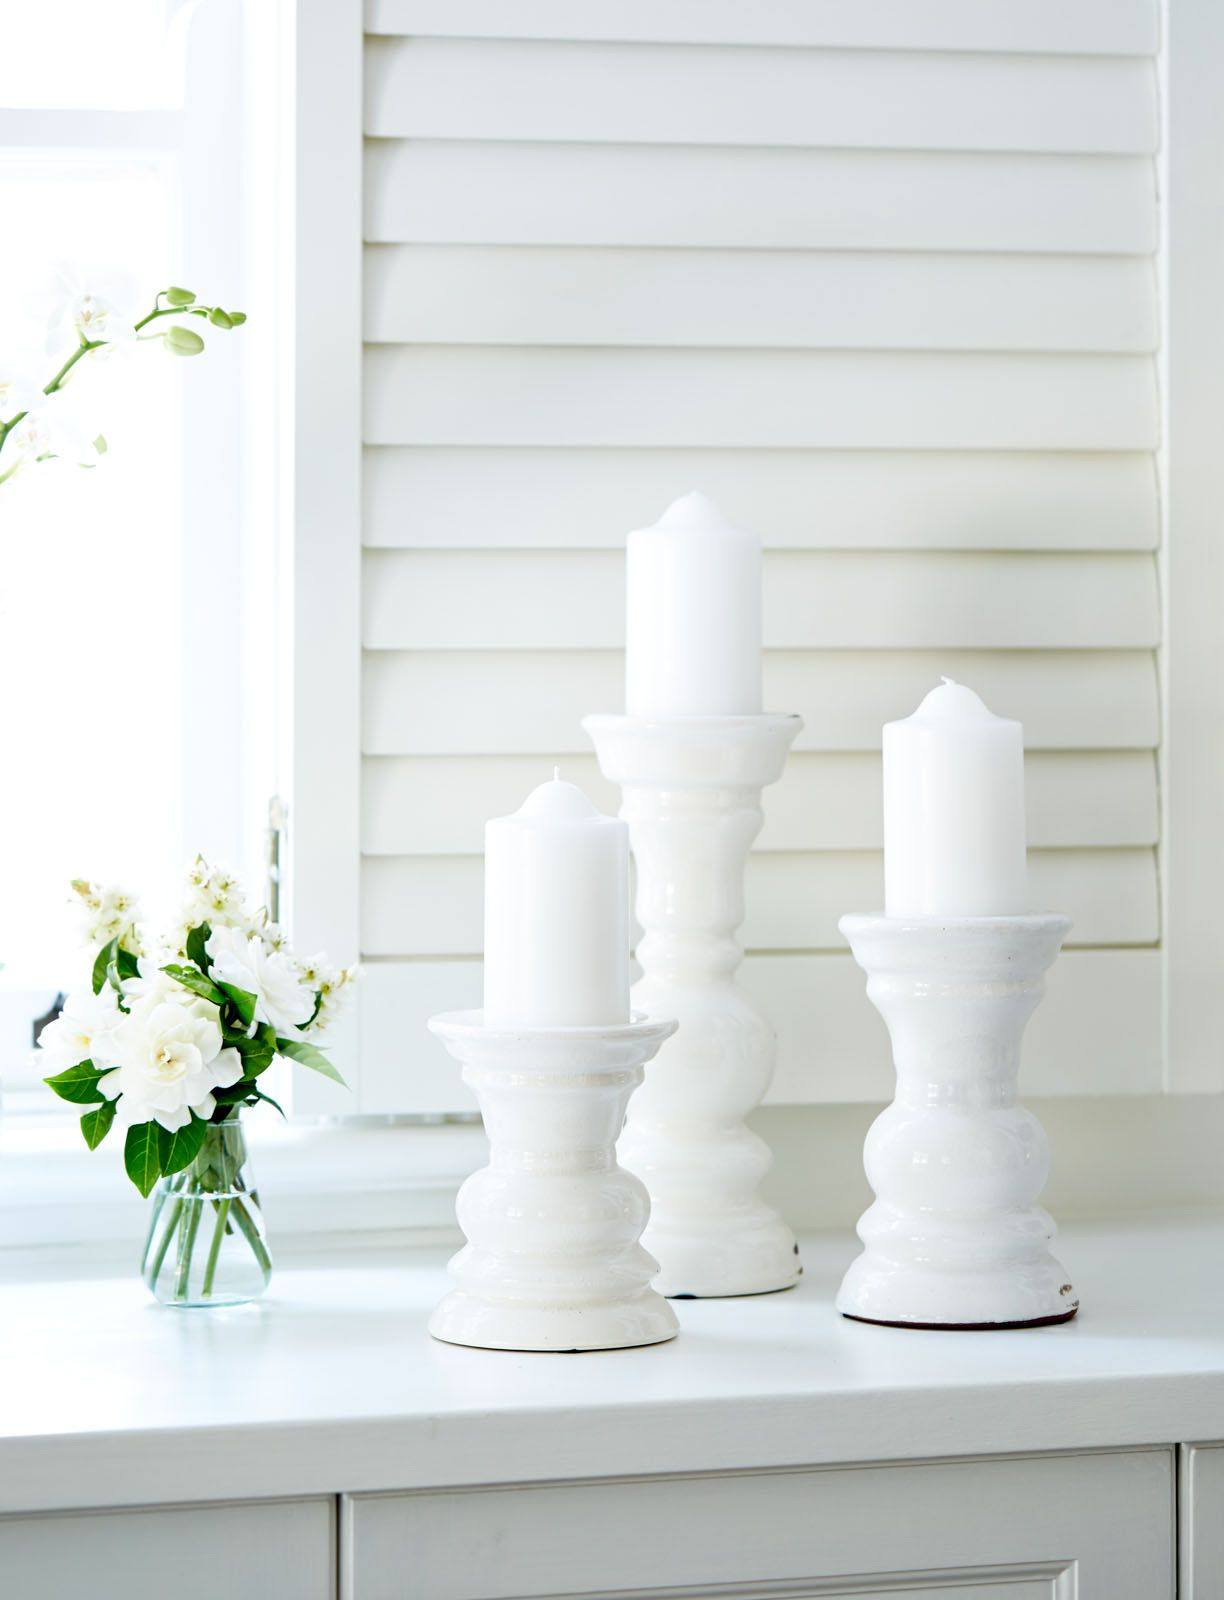 French Style Ceramic Candle Holders Wwwlavenderhillinteriorscomau